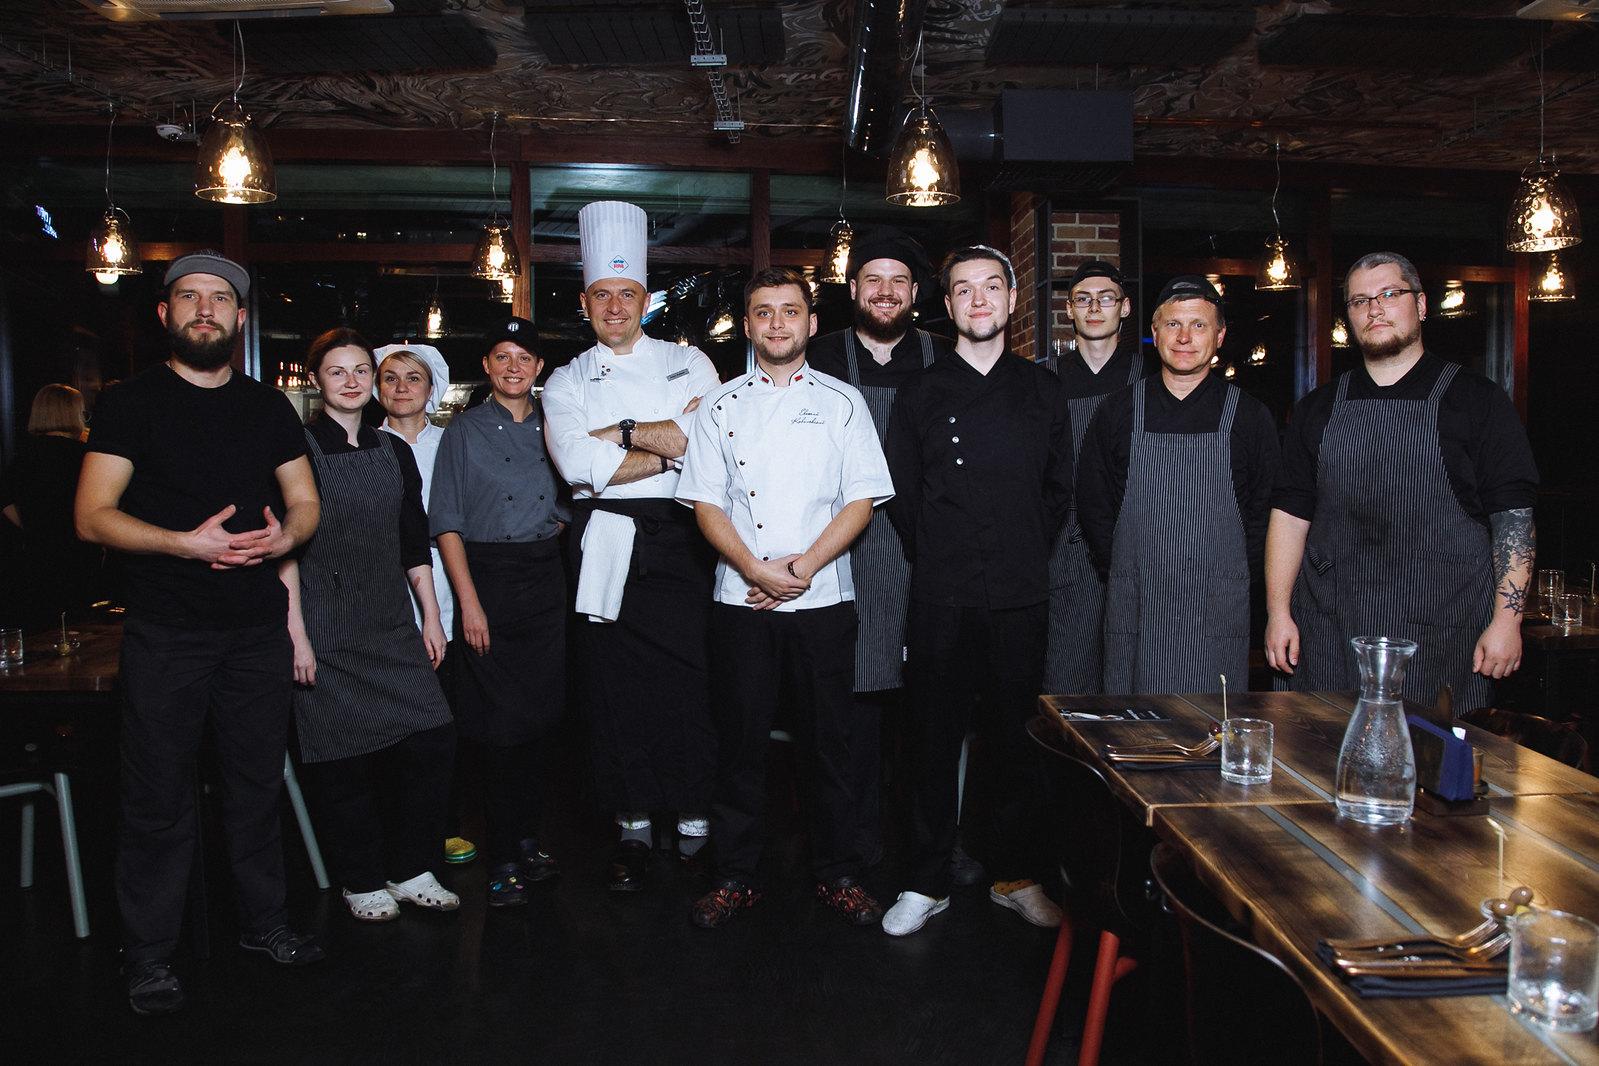 Ужин от шеф-повара Антона Каленика в AnimalFarm с marusimba1-44